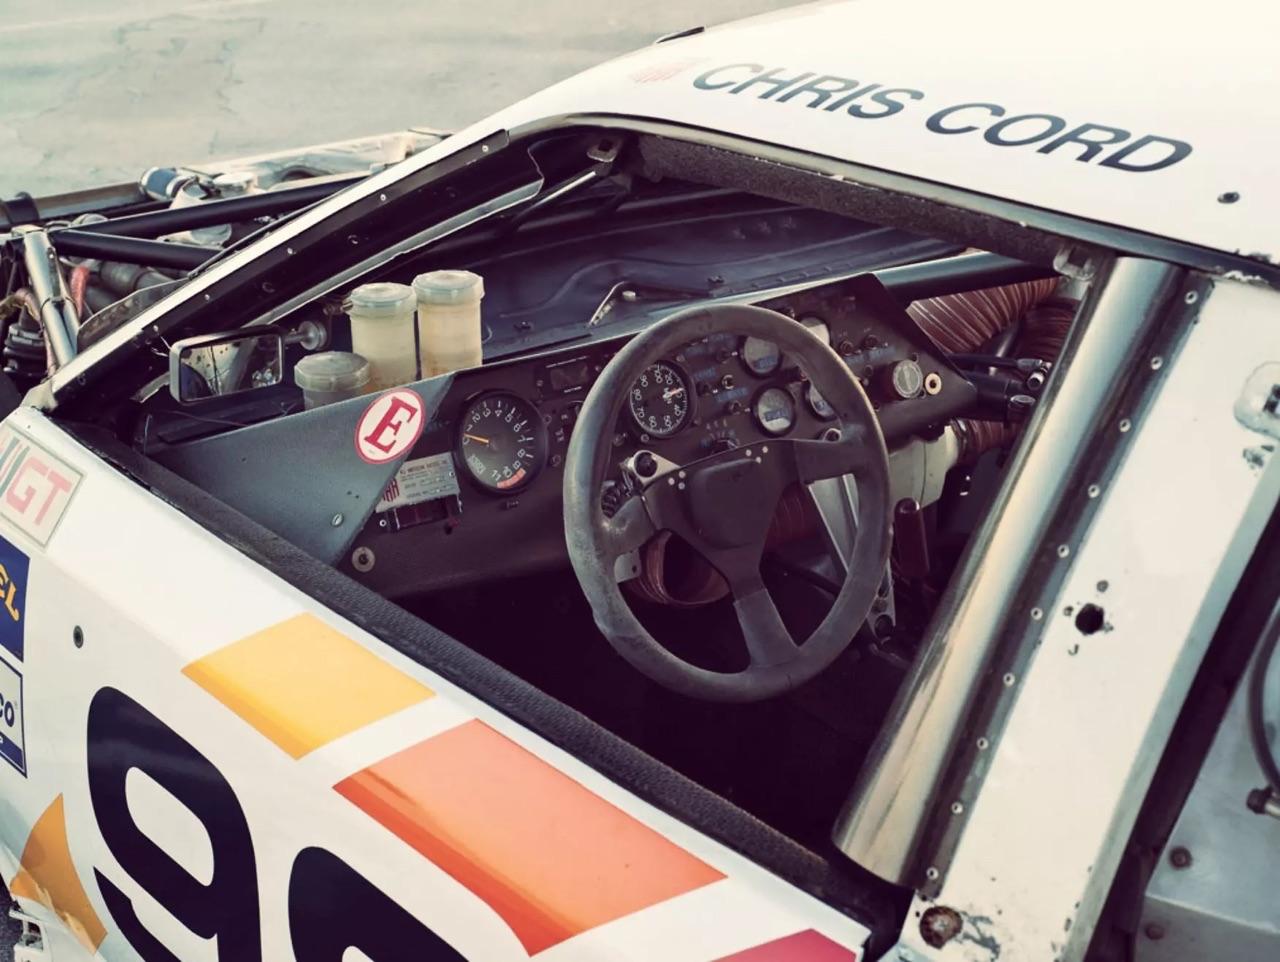 Toyota Celica Turbo IMSA GTO - 100% débridée ! 15